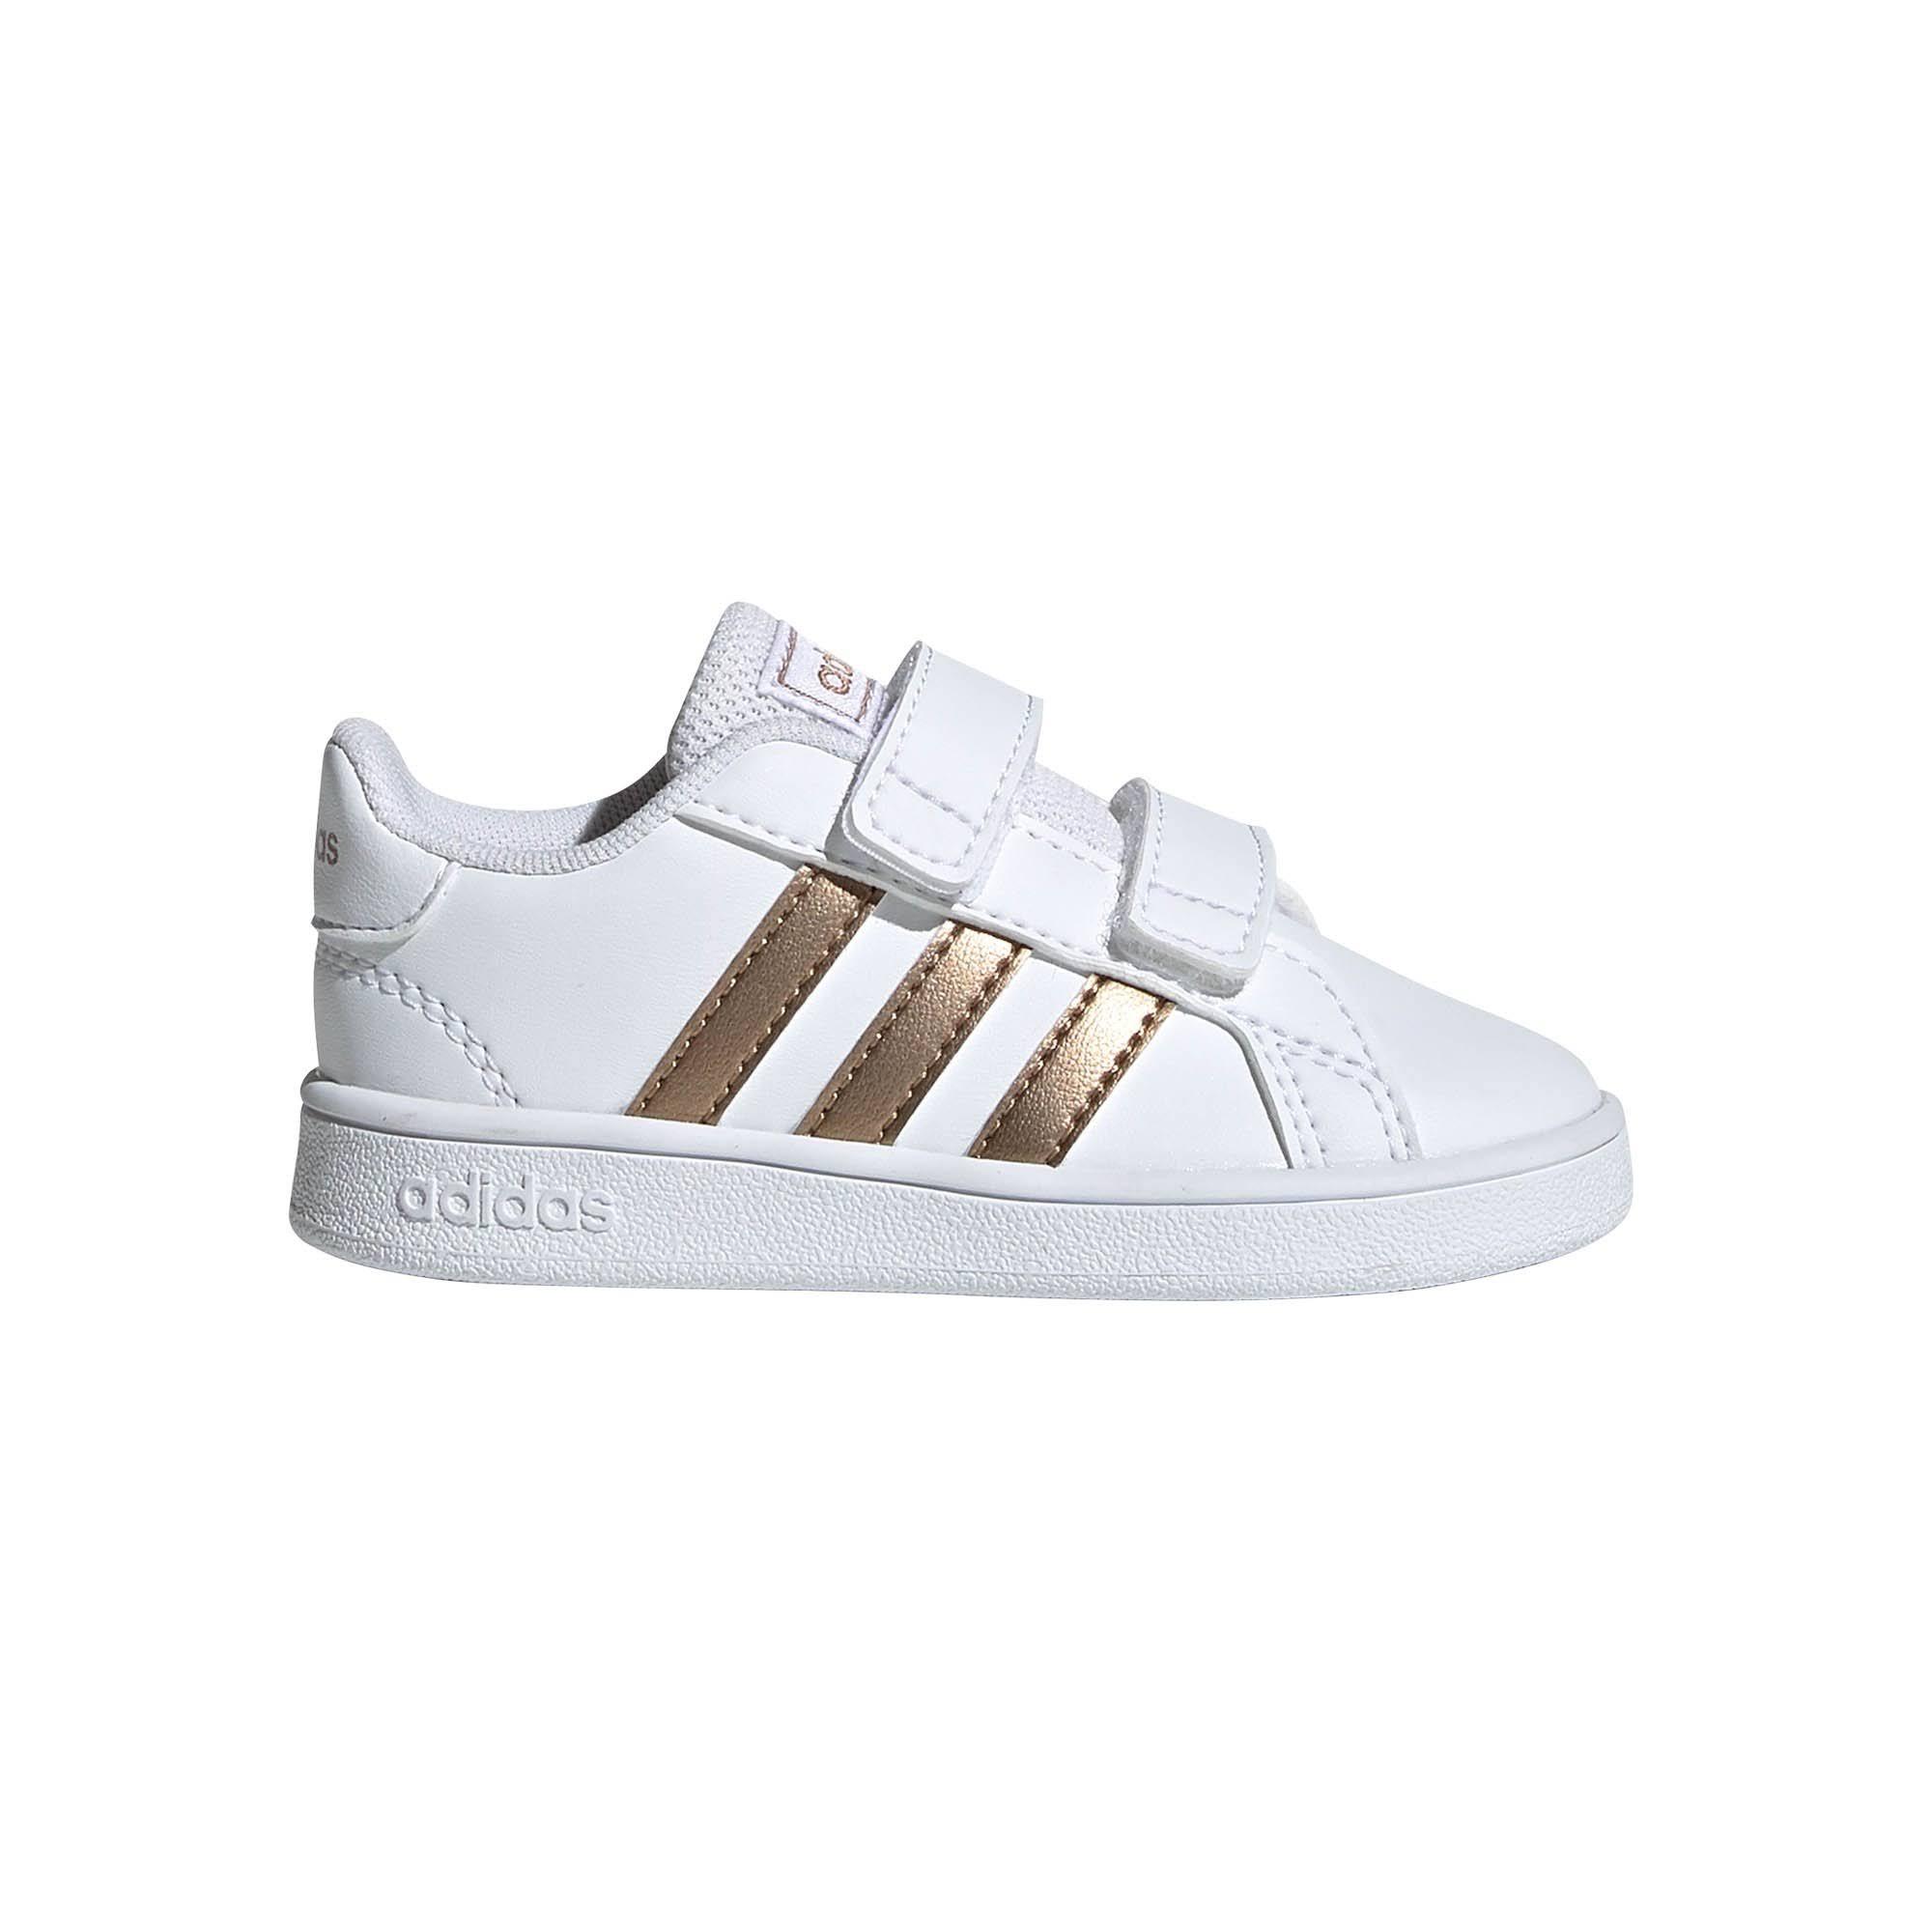 Adidas Grand Court Infant